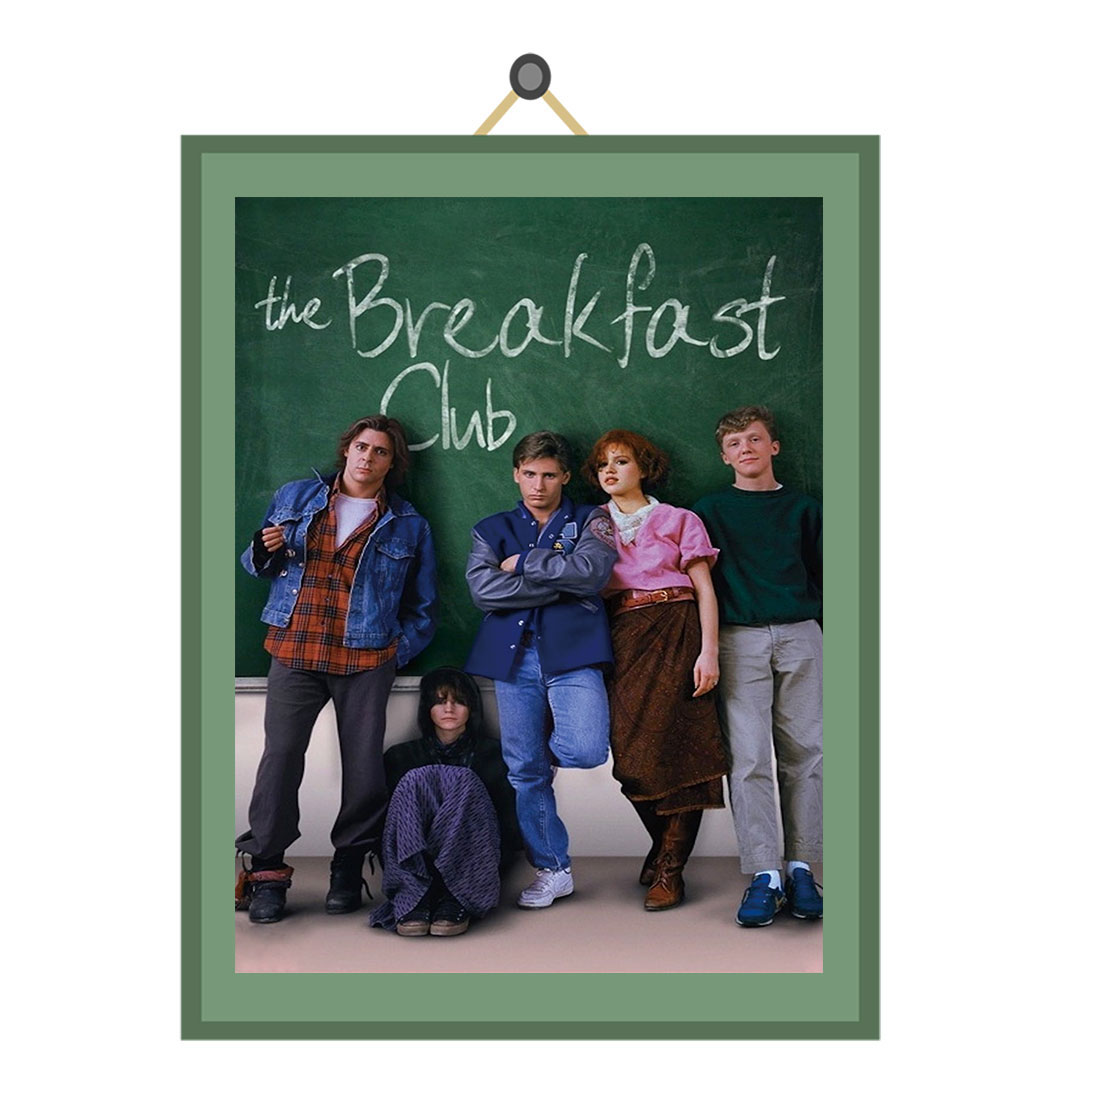 THE BREAKFAST CLUB MOVIE POSTER FILM A4 A3 ART PRINT CINEMA